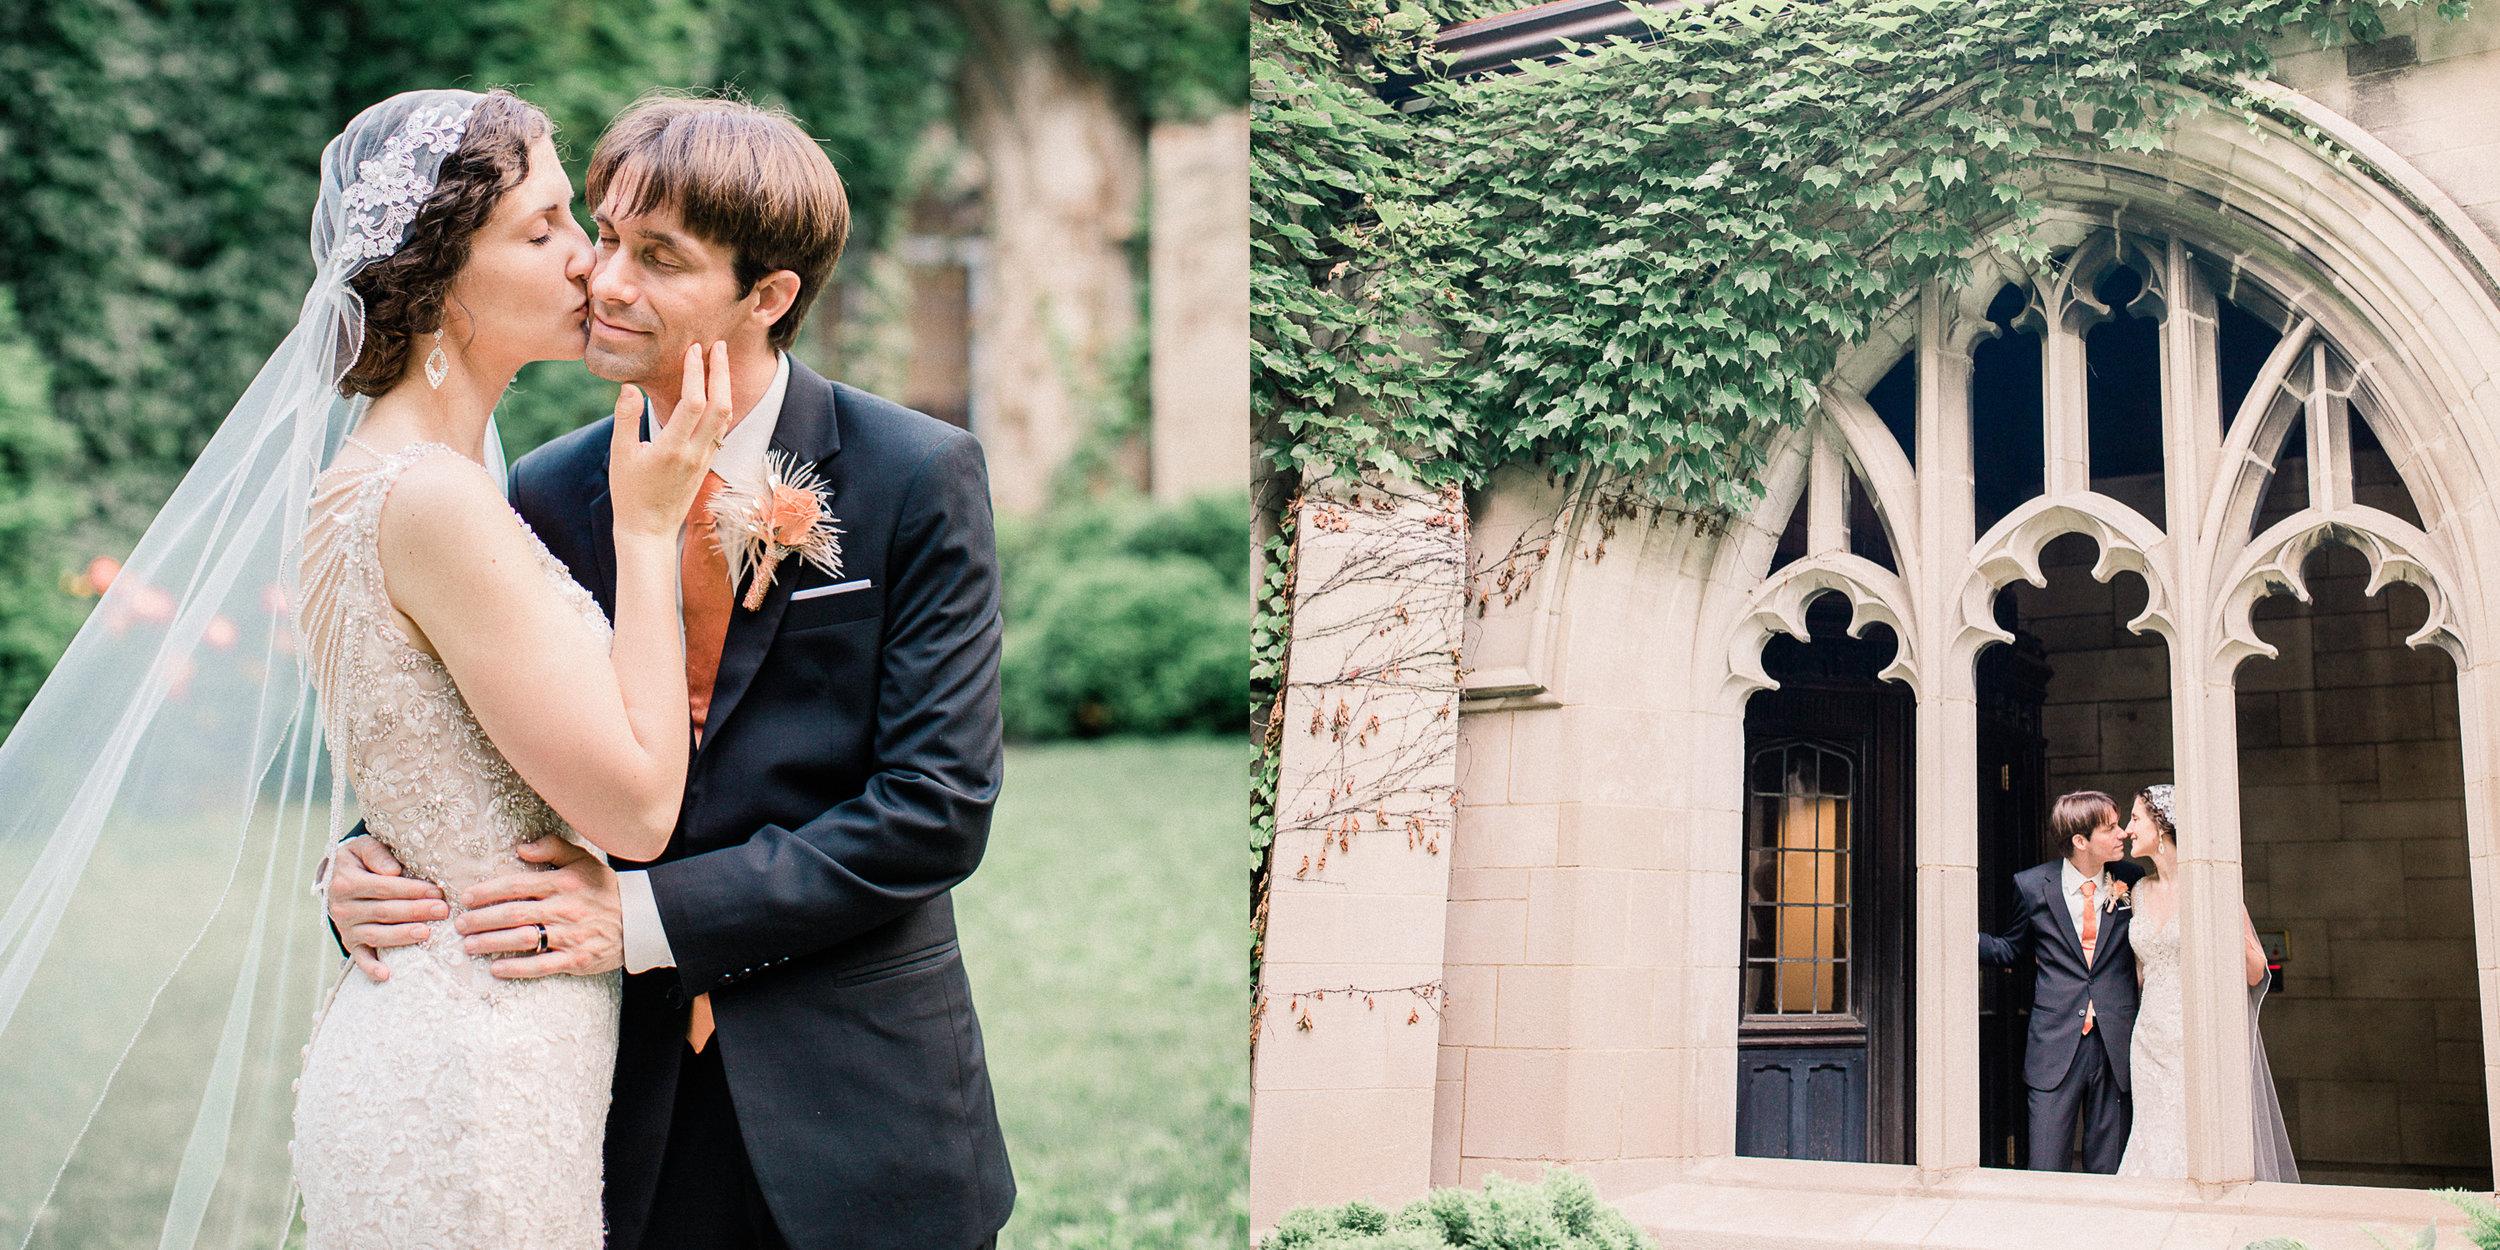 Dorothy_Louise_Photography_University_of_Chicago_Wedding17.jpg